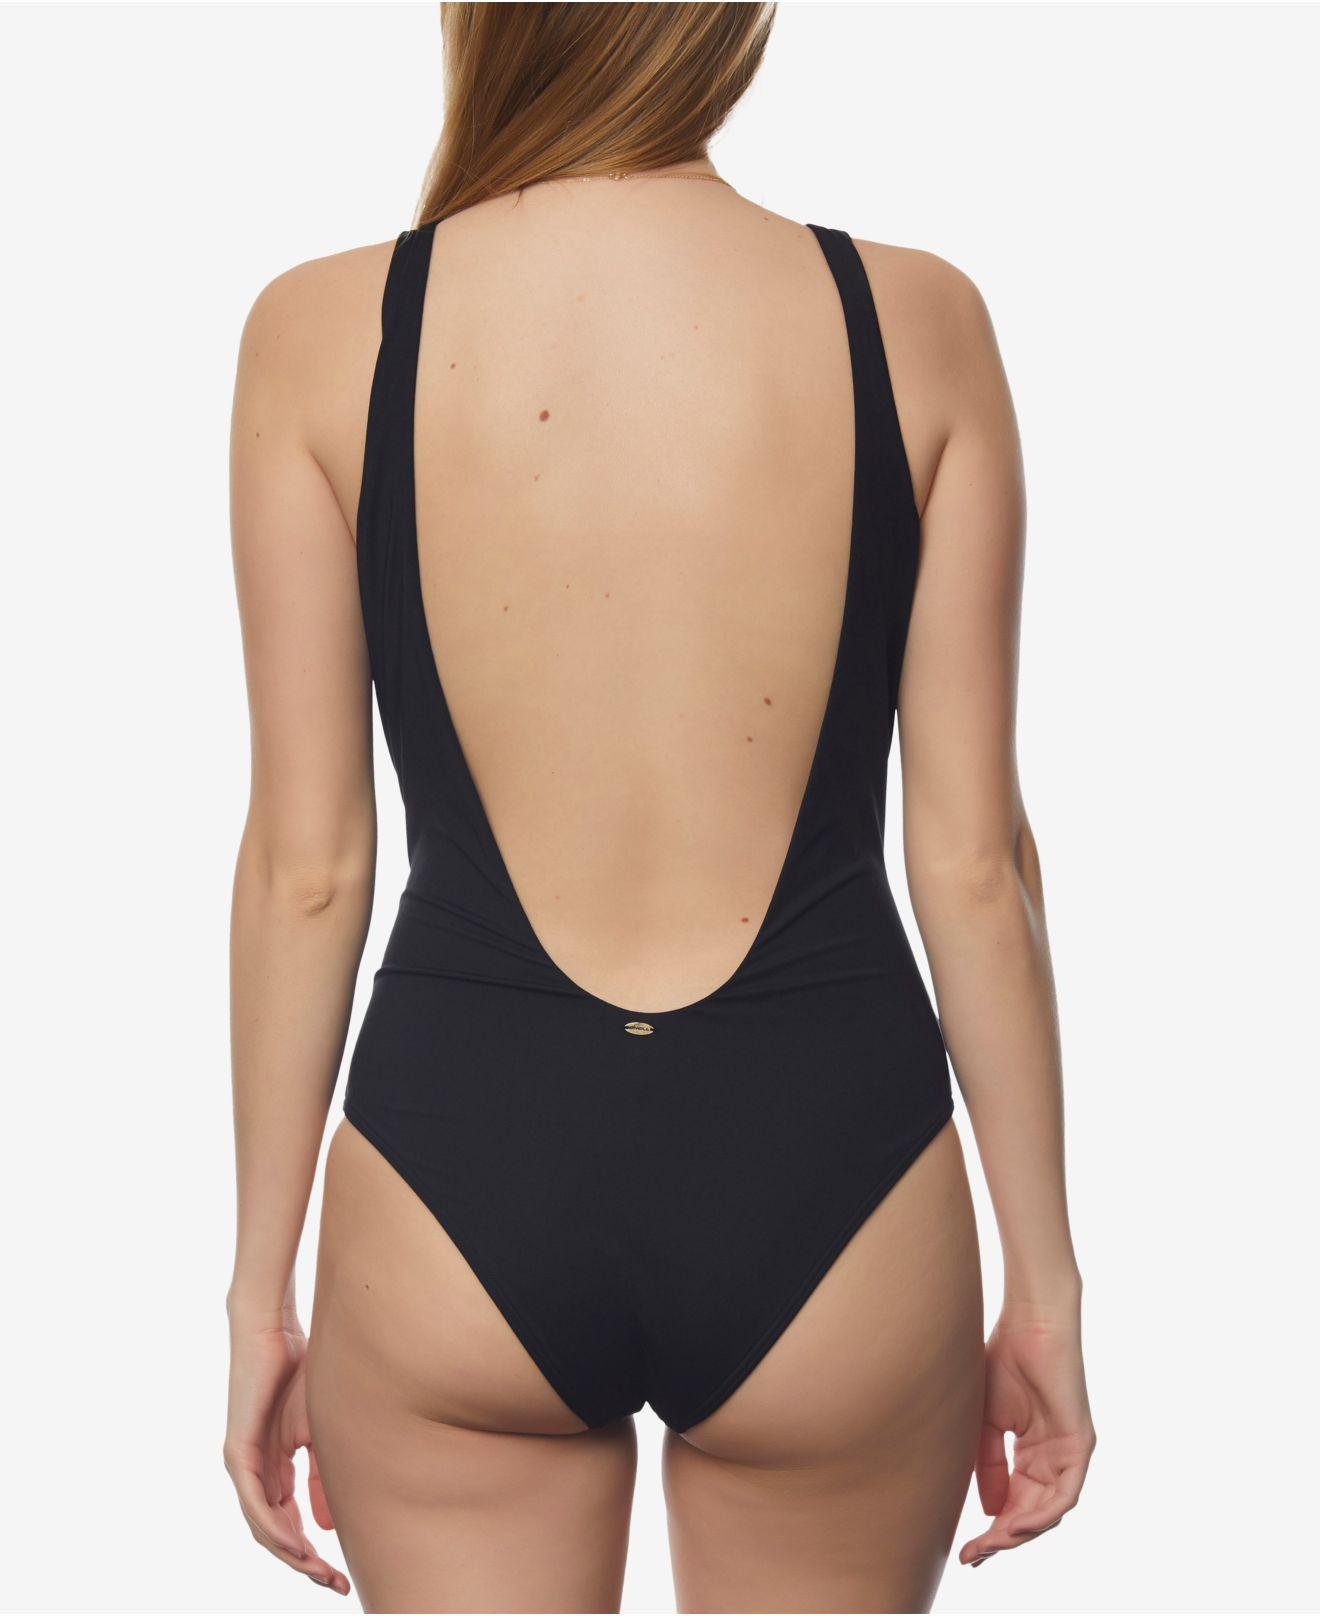 43e283d5f0 Lyst - O'neill Sportswear Juniors' Salt Water Solids Lattice-front Cheeky  One-piece Swimsuit in Black